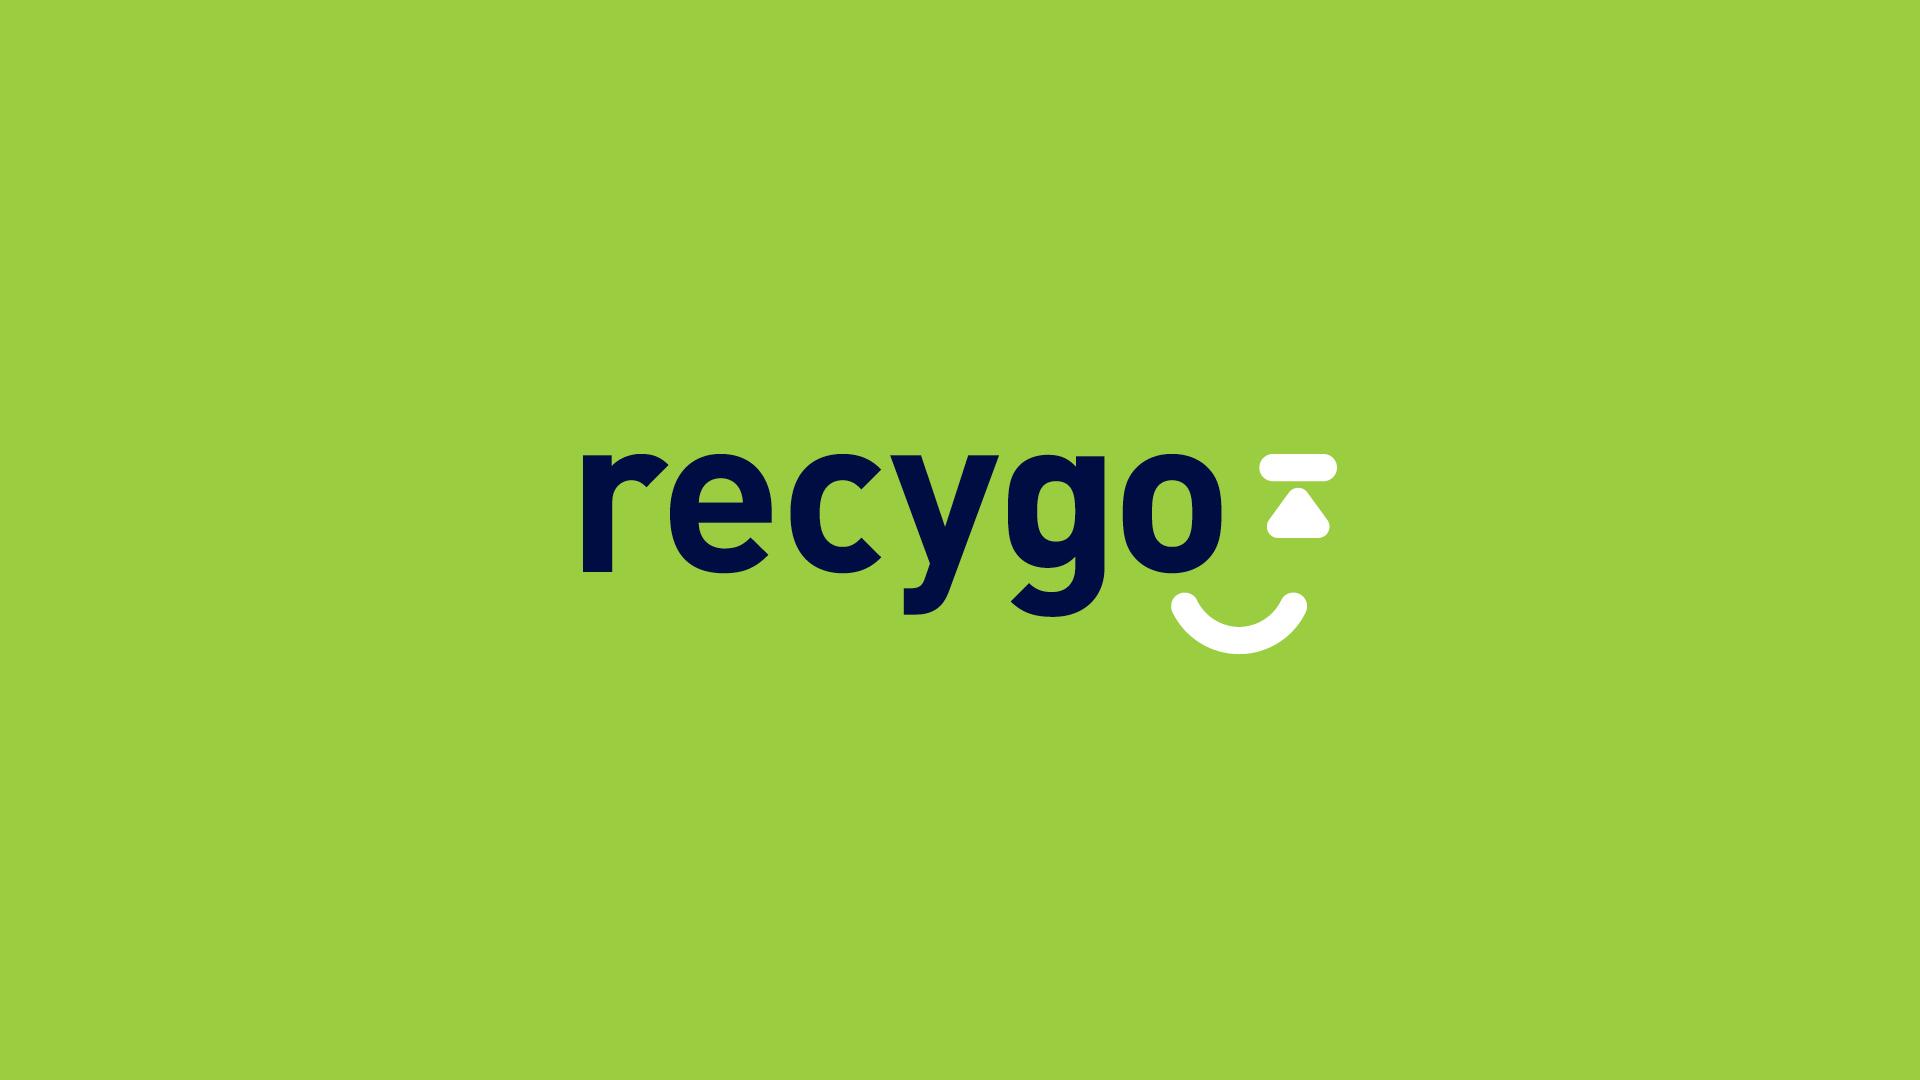 recygo_vignette_1